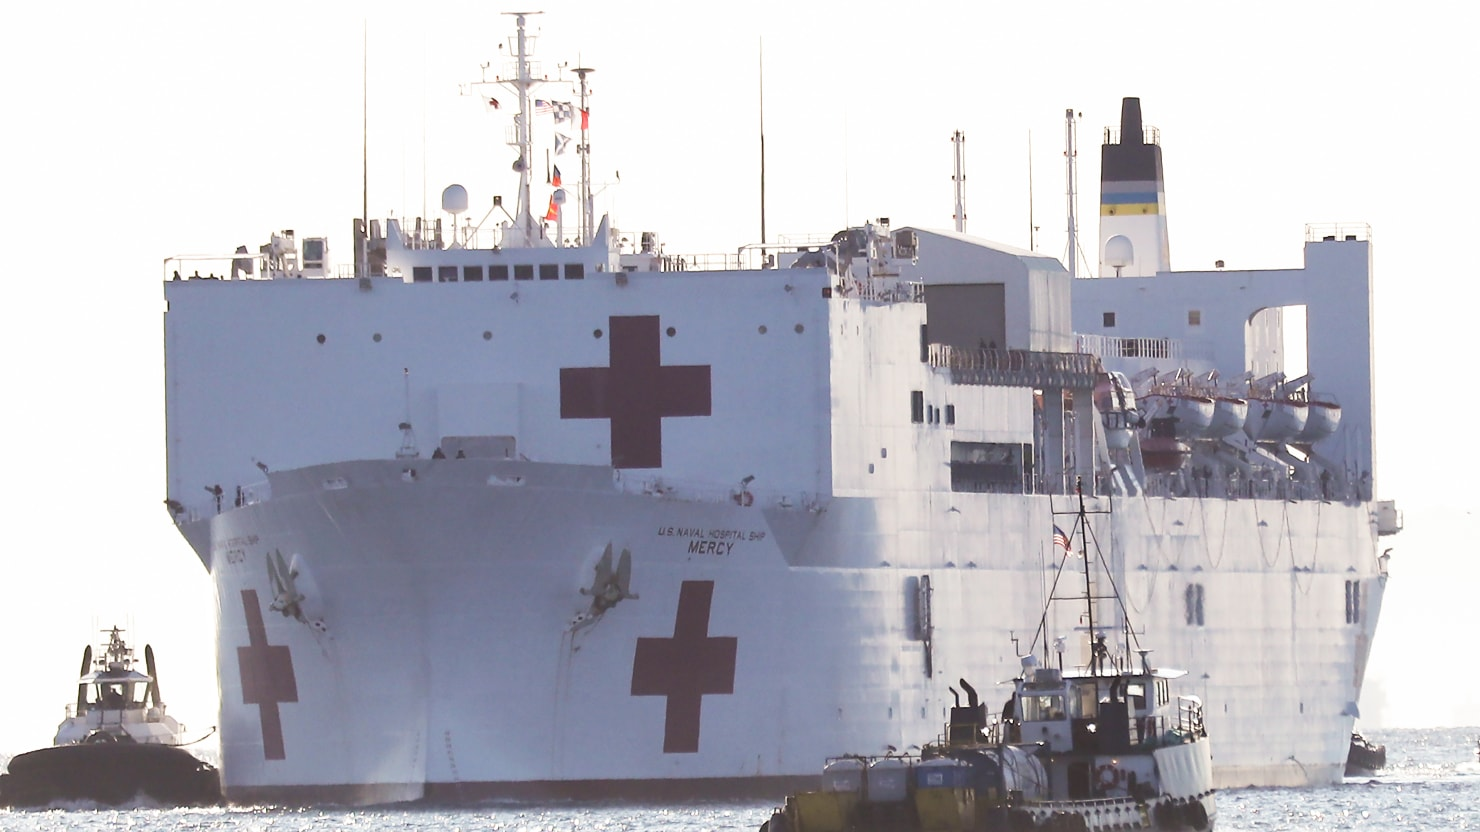 Engineer Tried to Crash Train Into Navy Hospital...